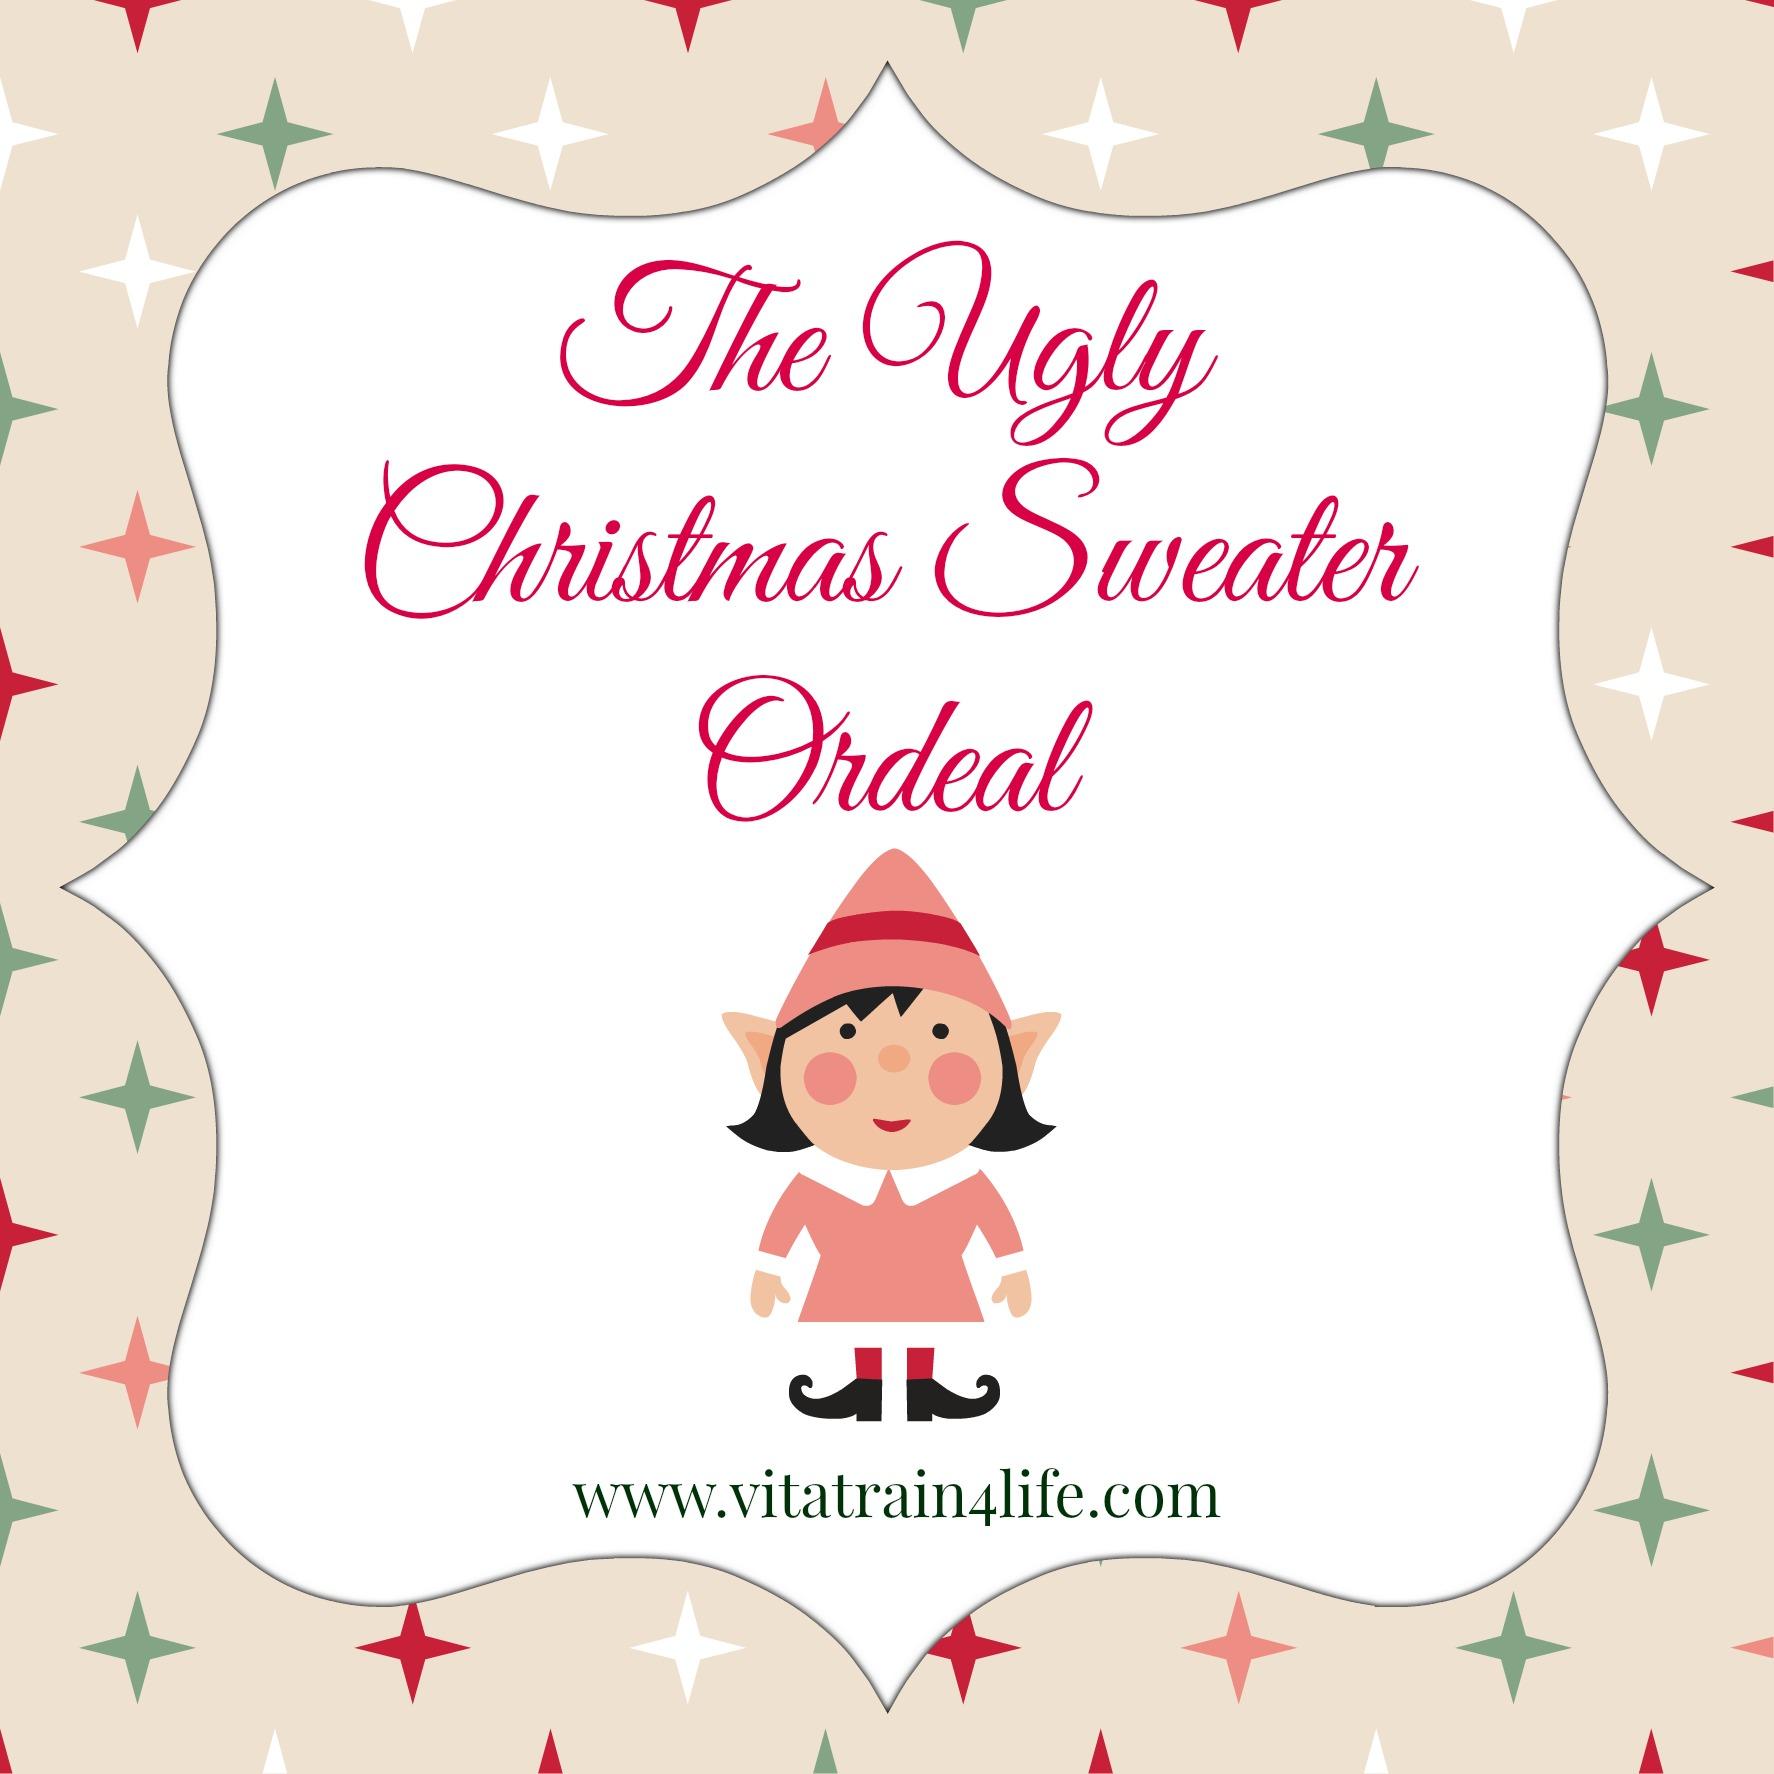 The Ugly Christmas Sweater Ordeal - VitaTrain4Life